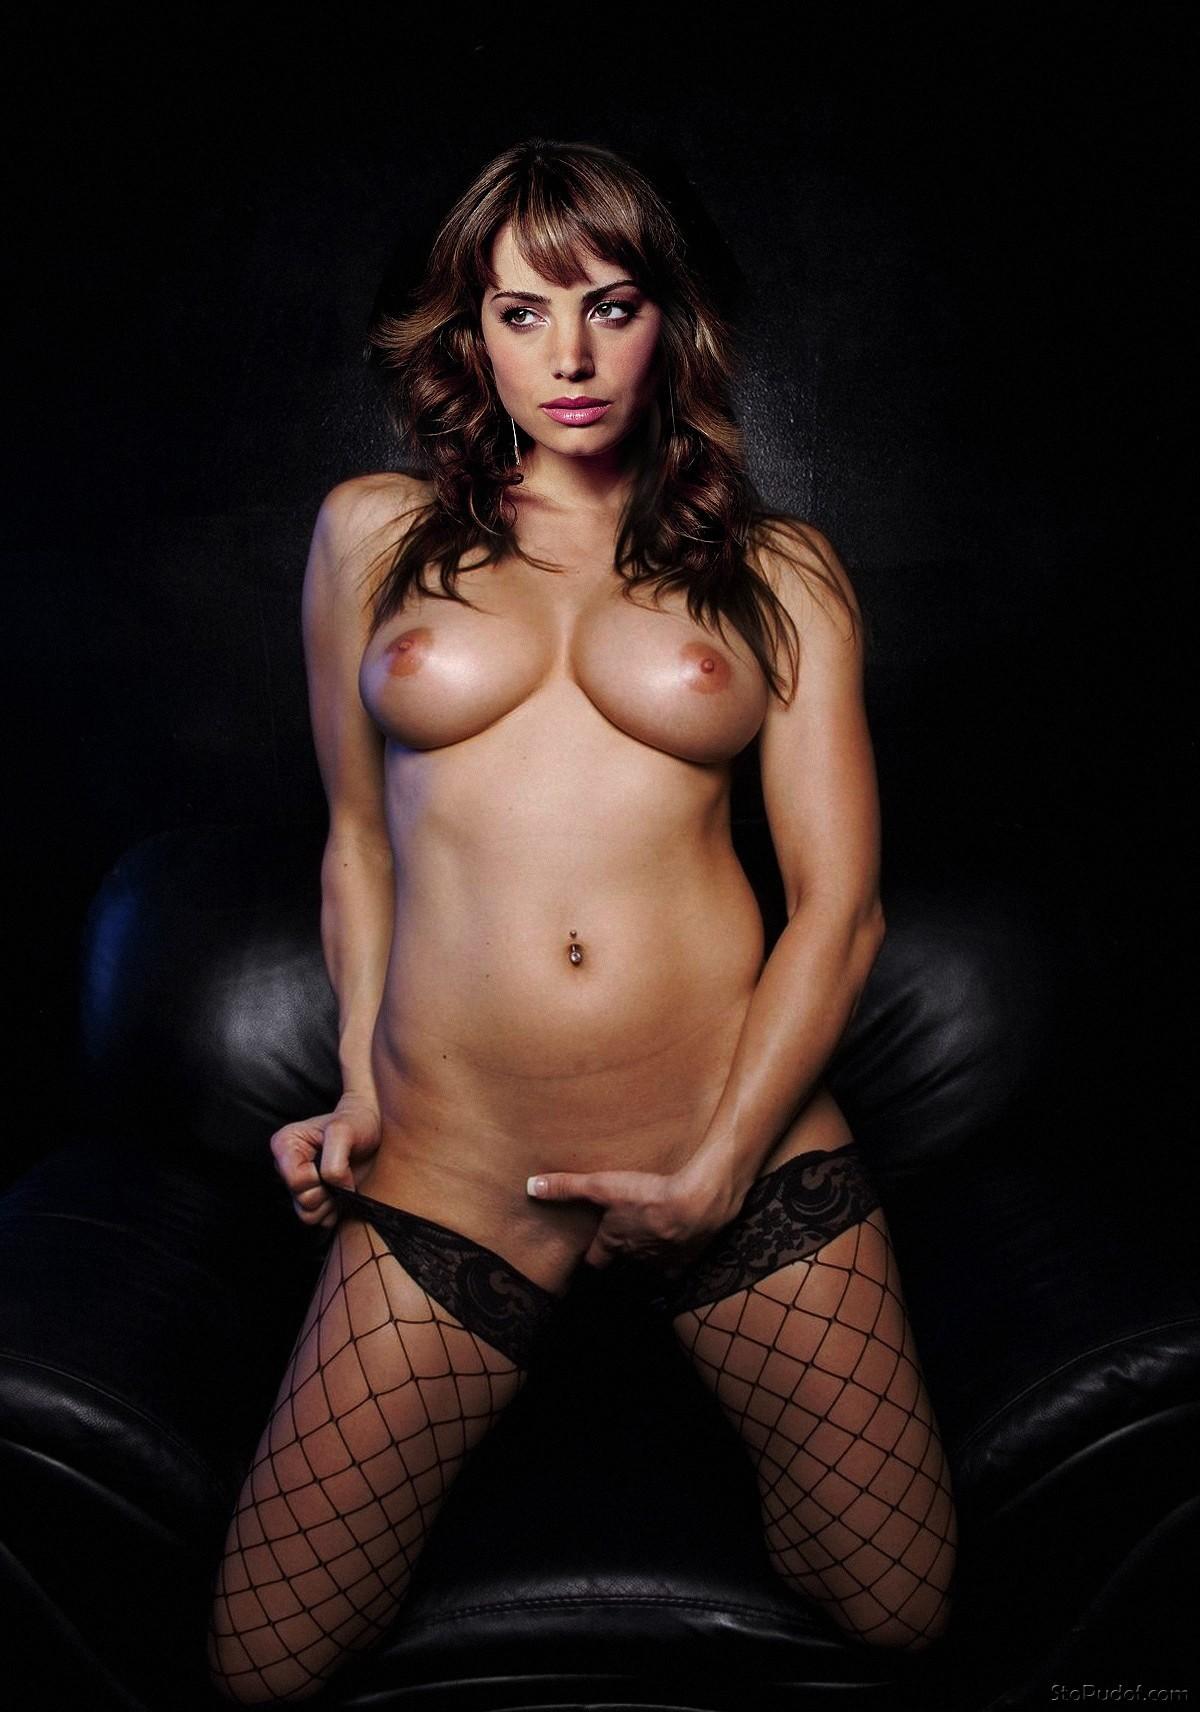 hot nude erica durance gifs